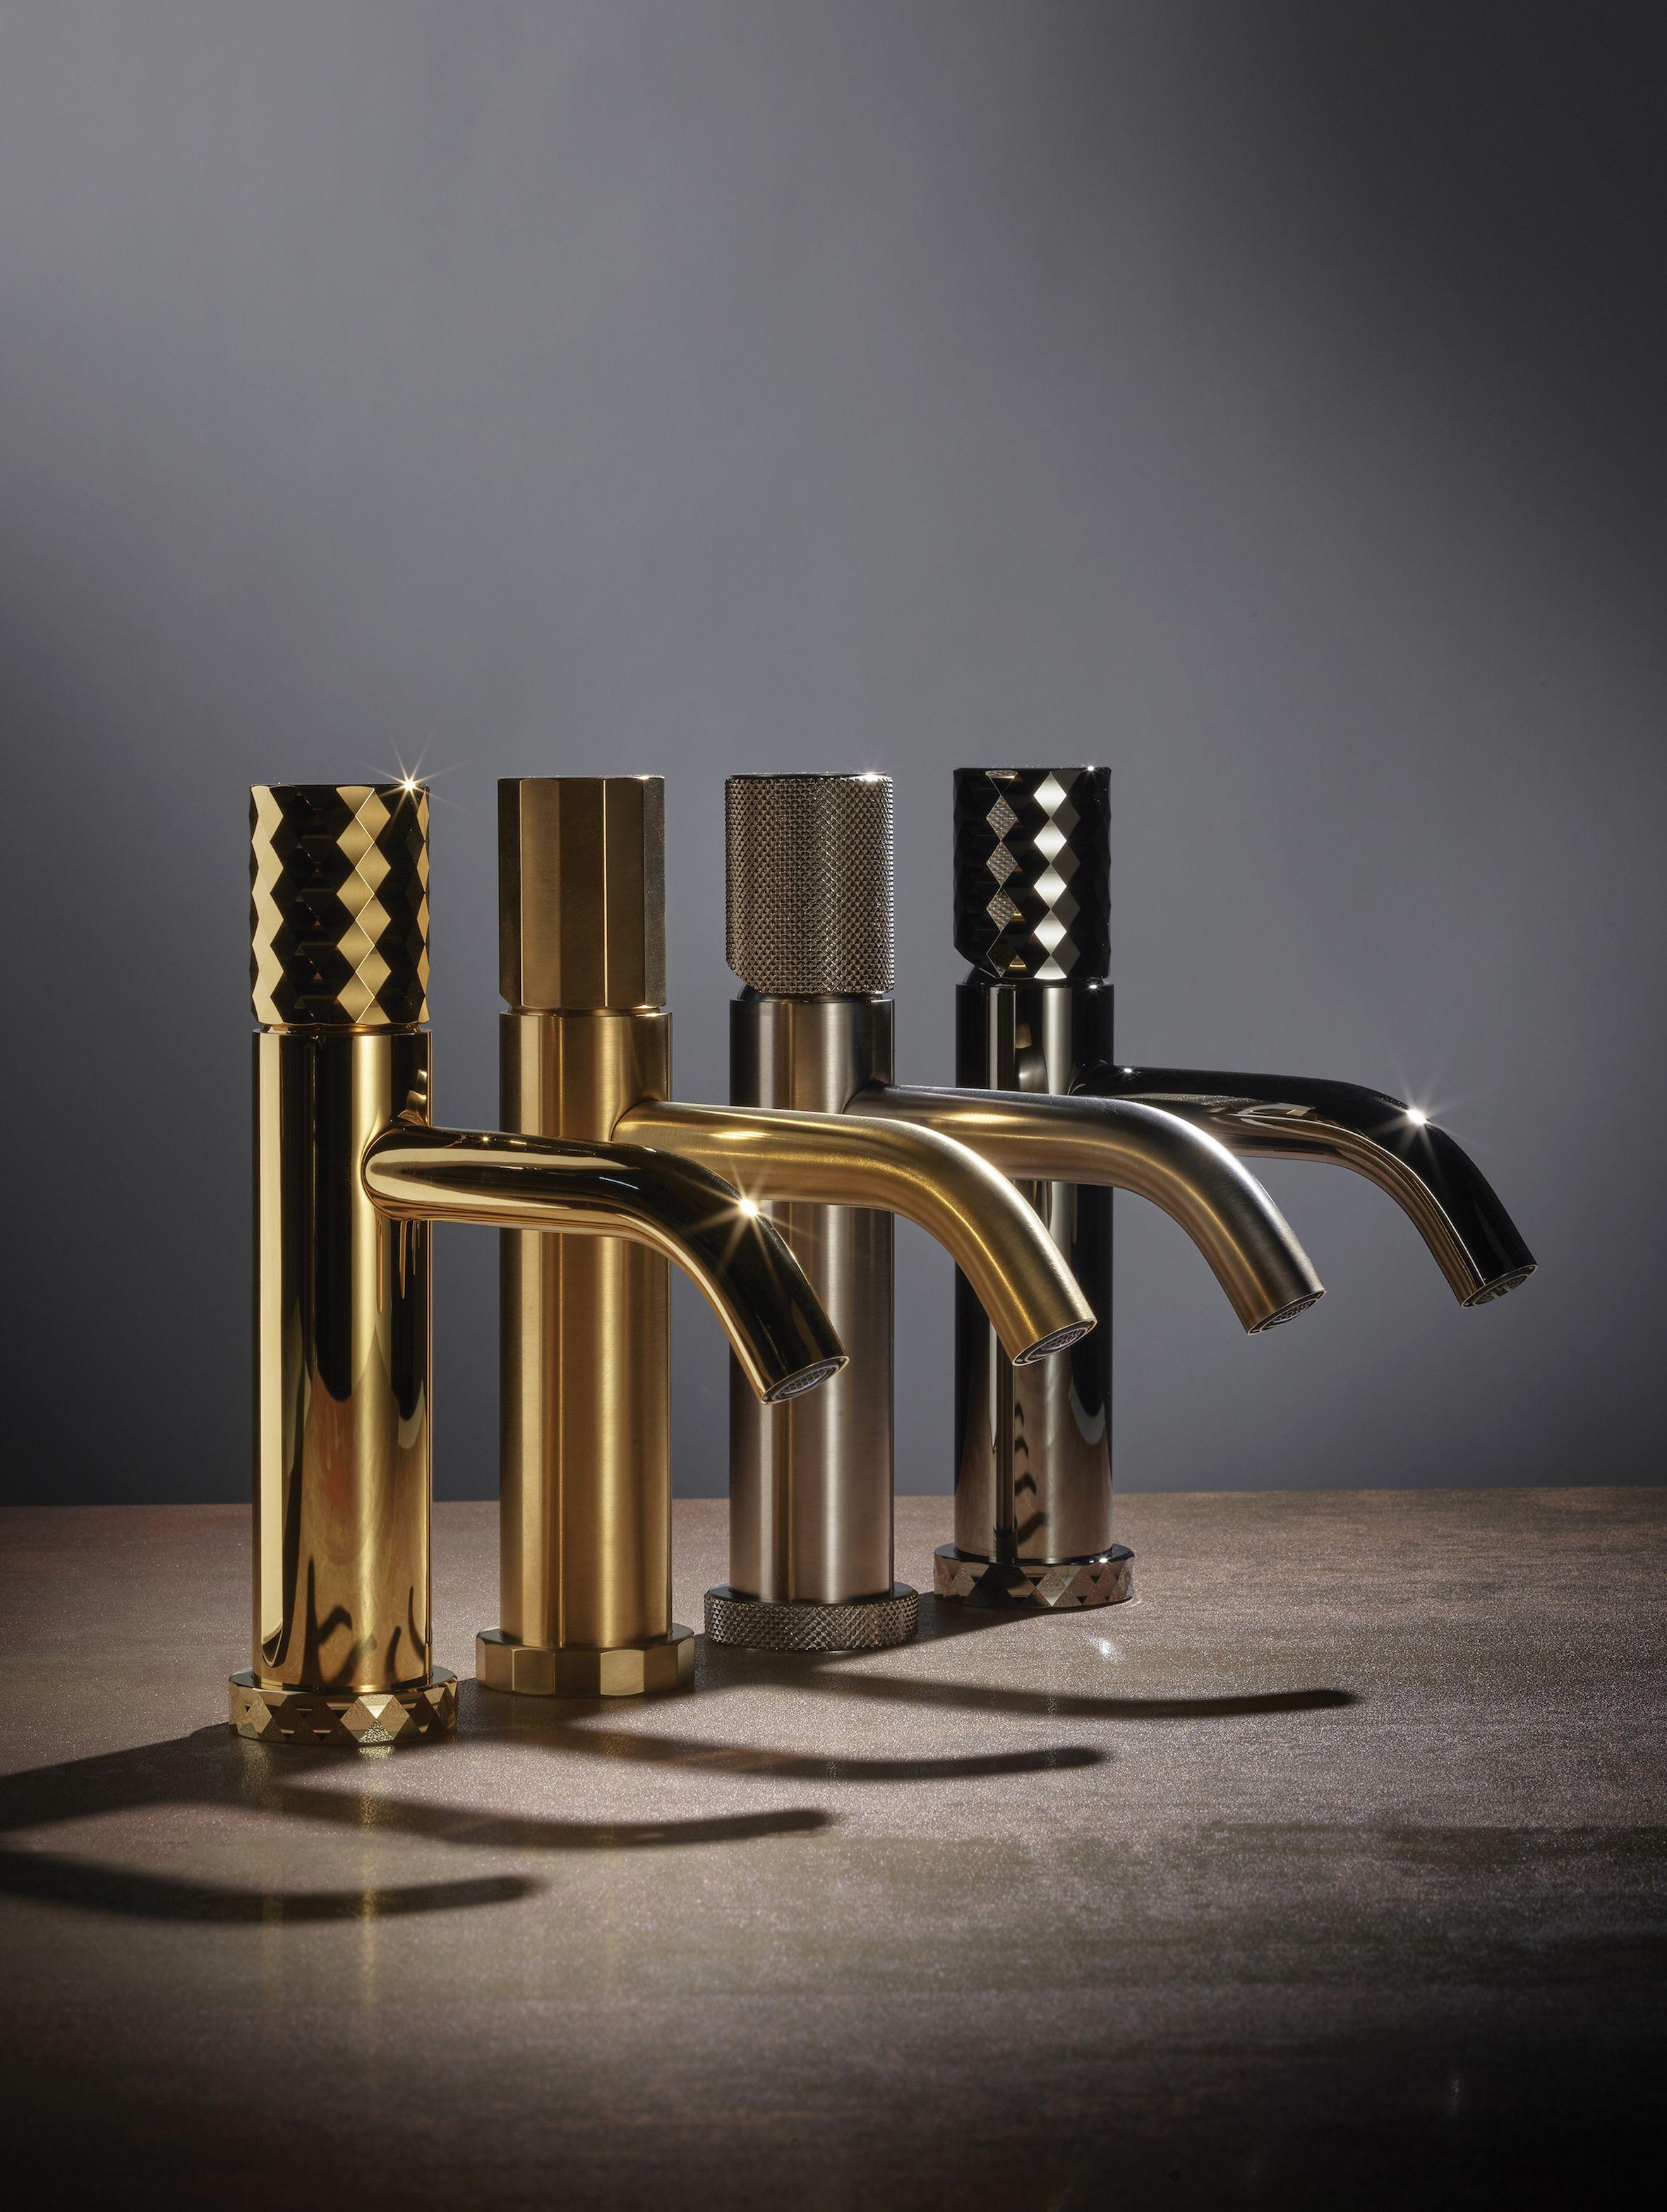 Beautiful Brassware From Italian Designers Fantini Bronze Gold Detailedbrassware Taps Beautifulbat Bathroom Design Faucet Design Wall Mounted Bath Taps